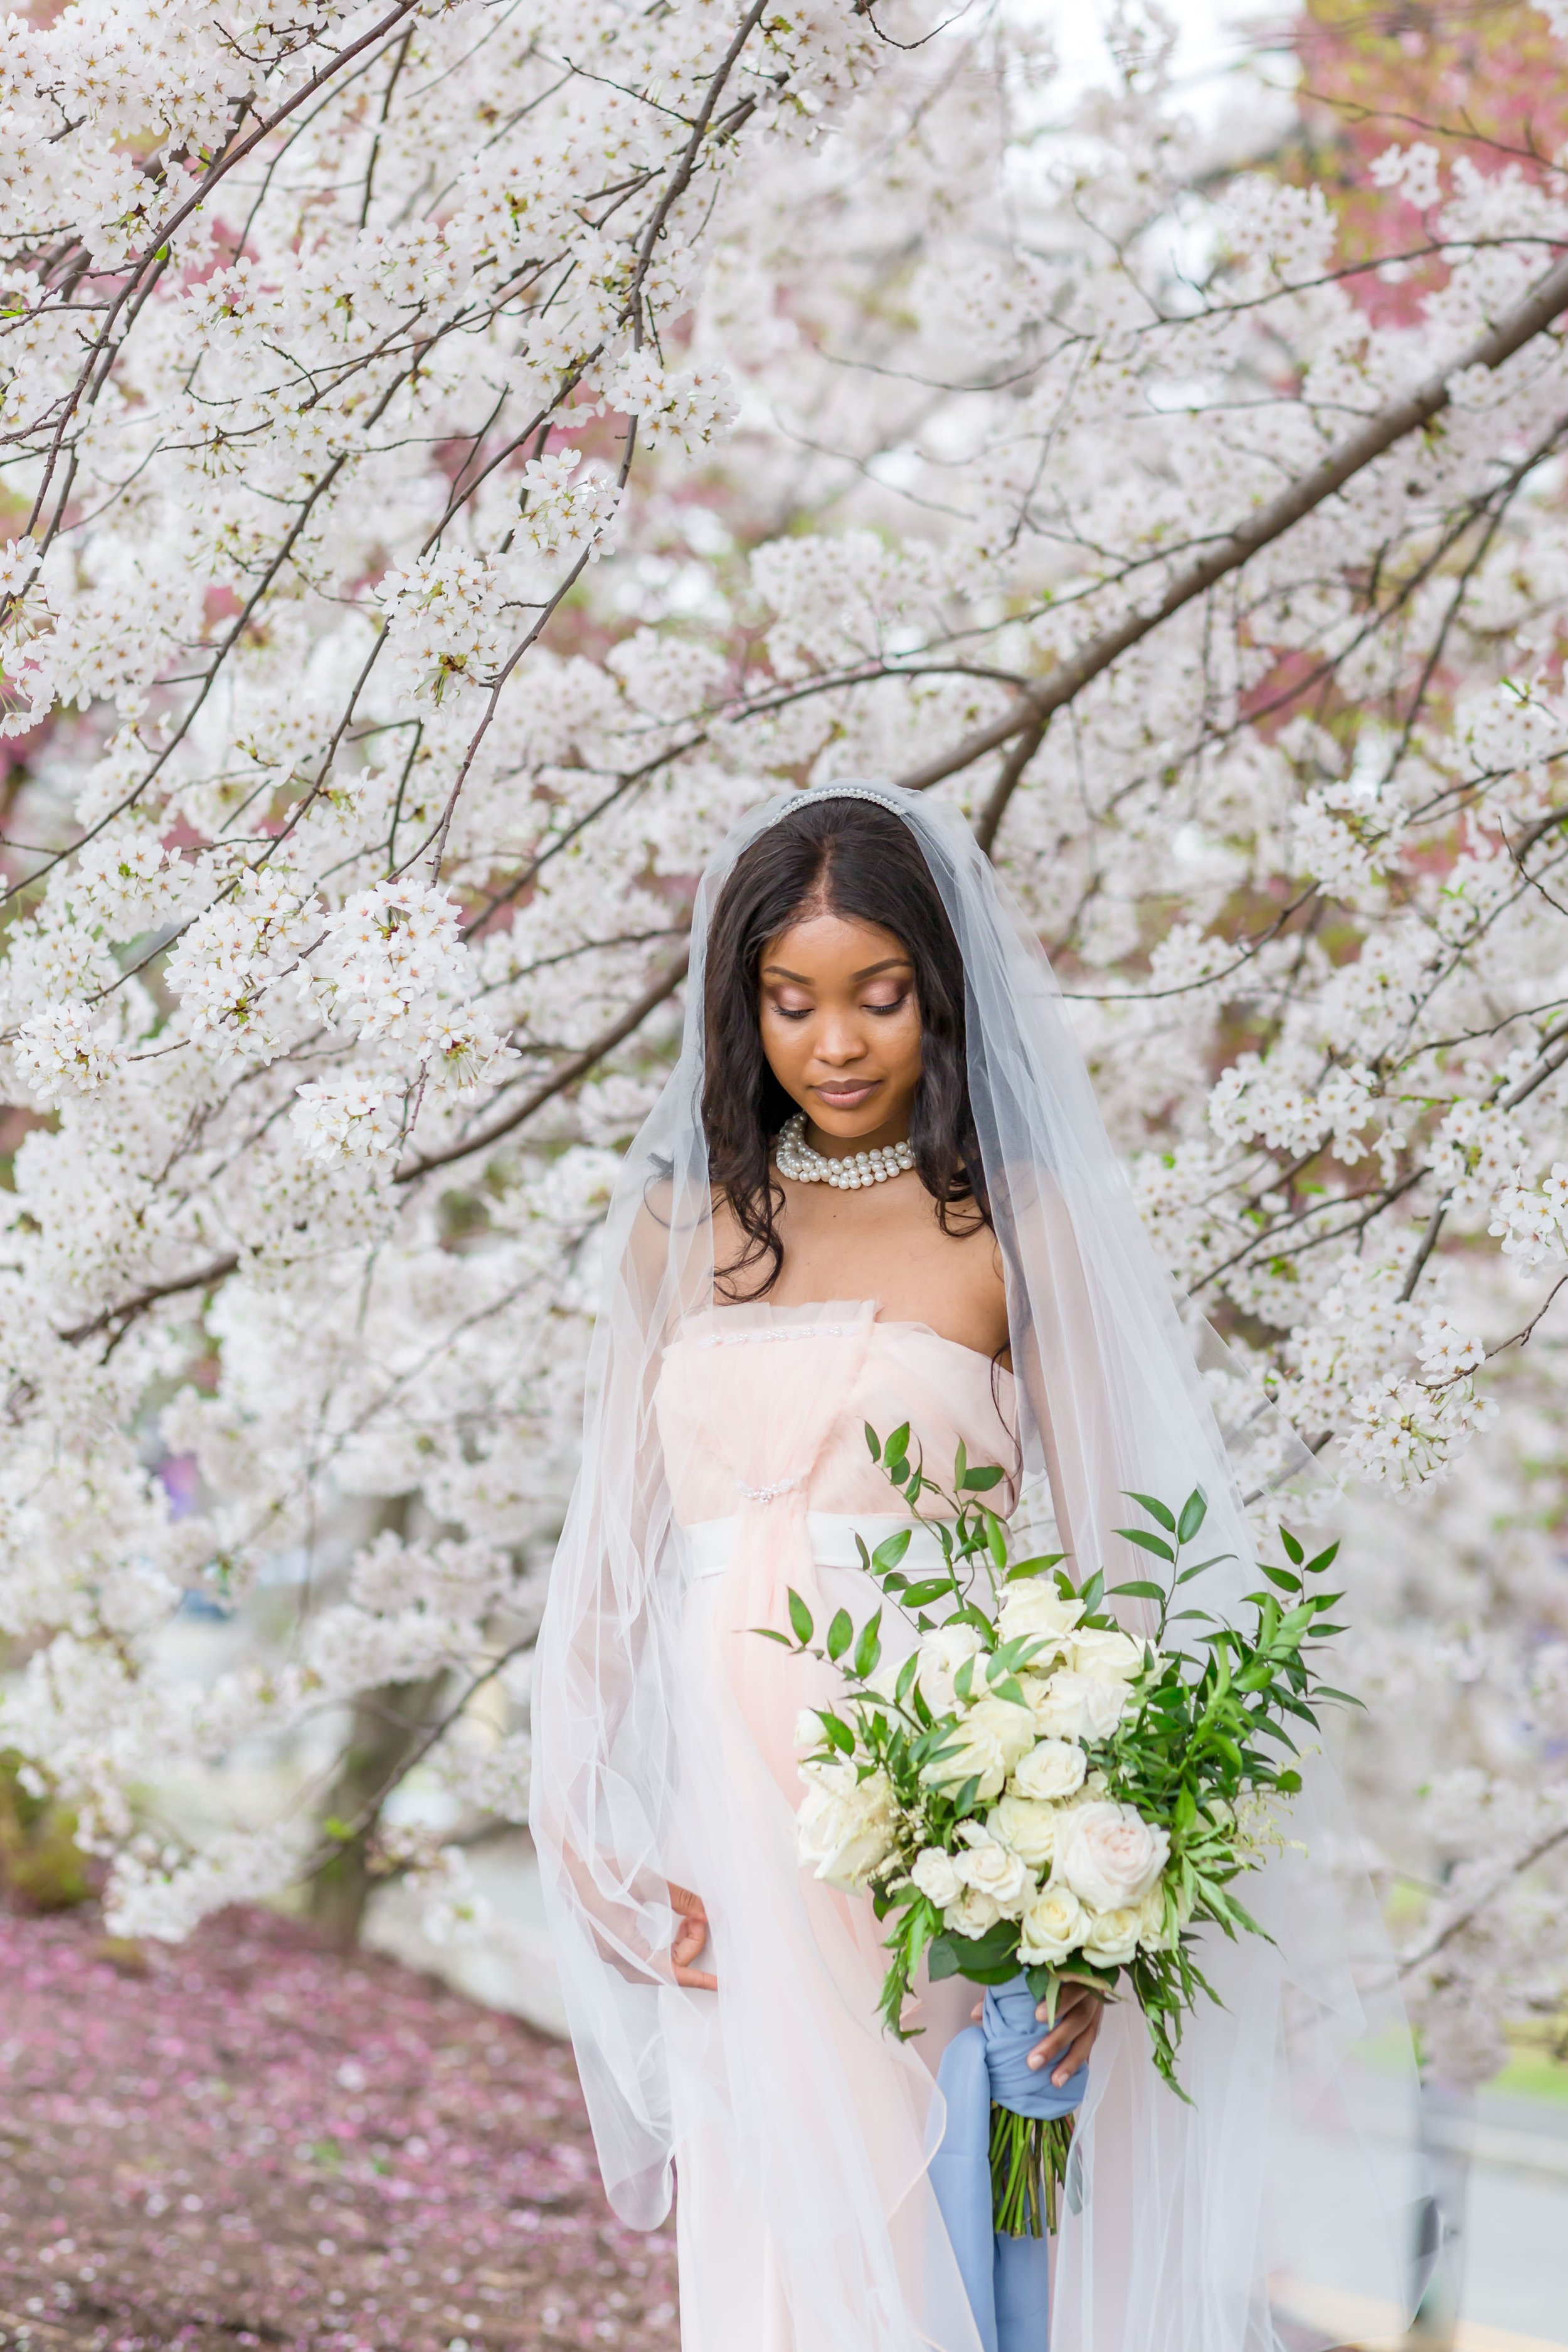 ScarlettExpressions-StyledShoot-Bridal-65.jpg